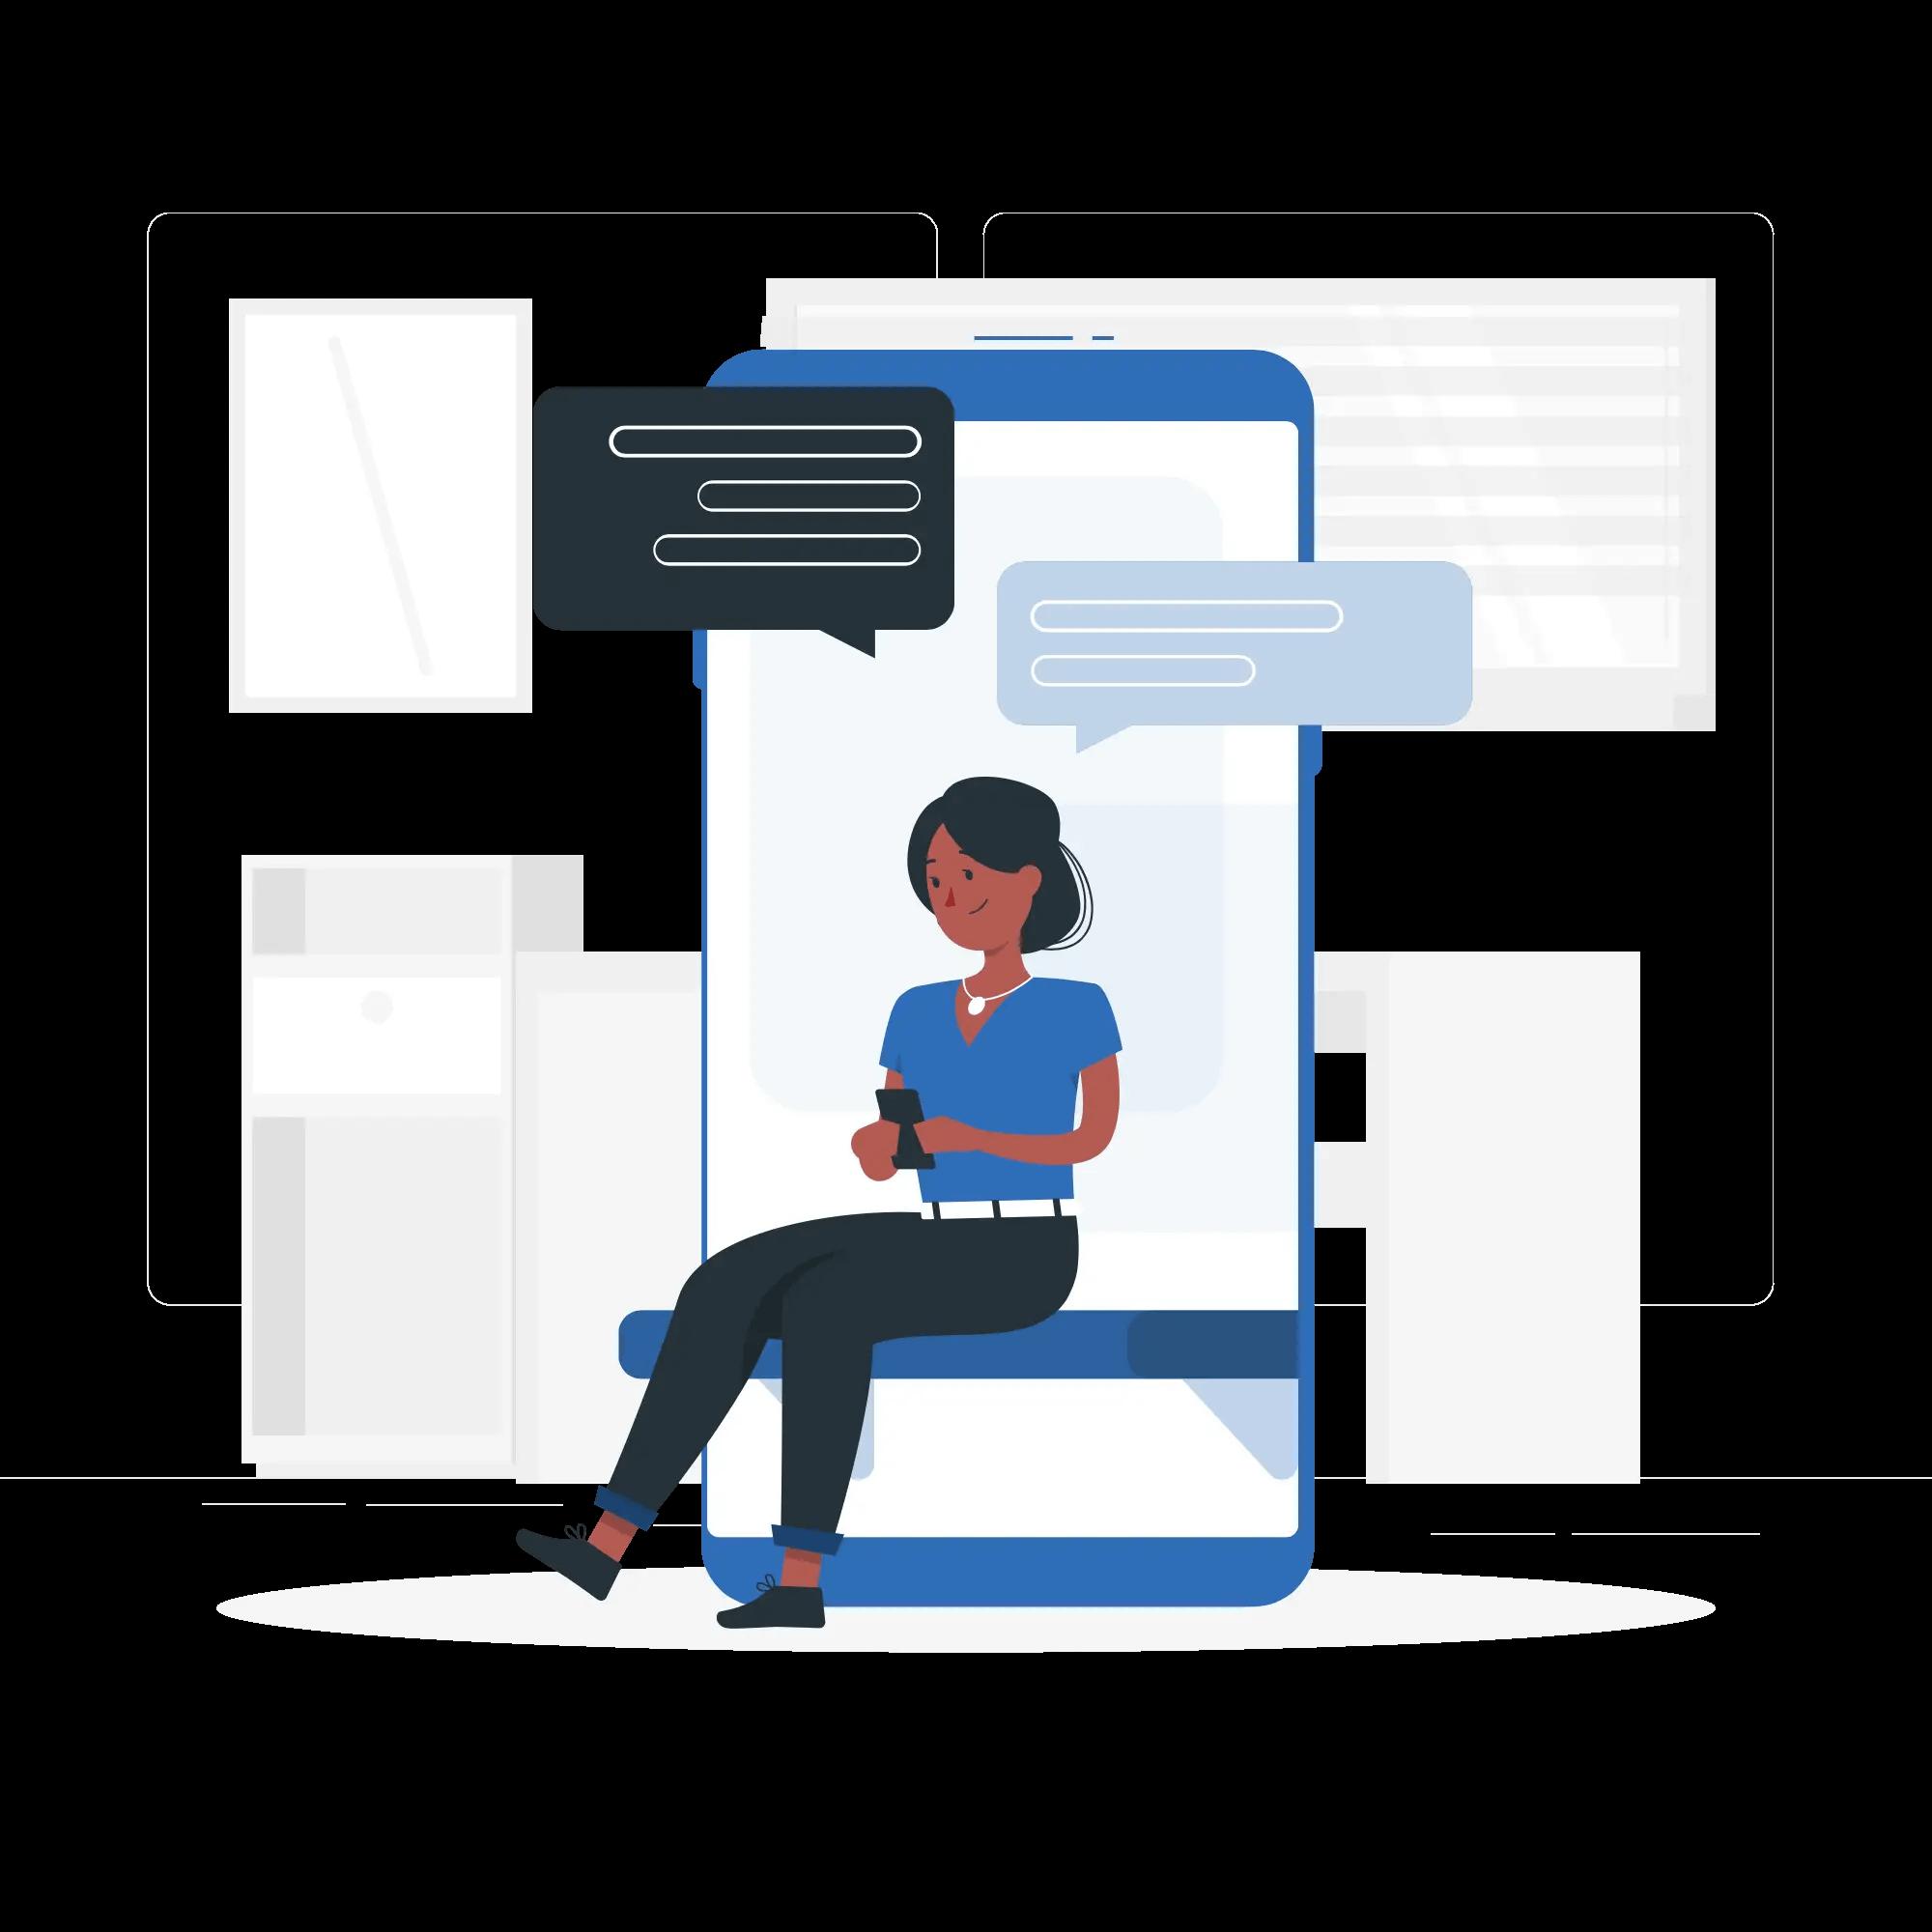 Messaging-rafiki